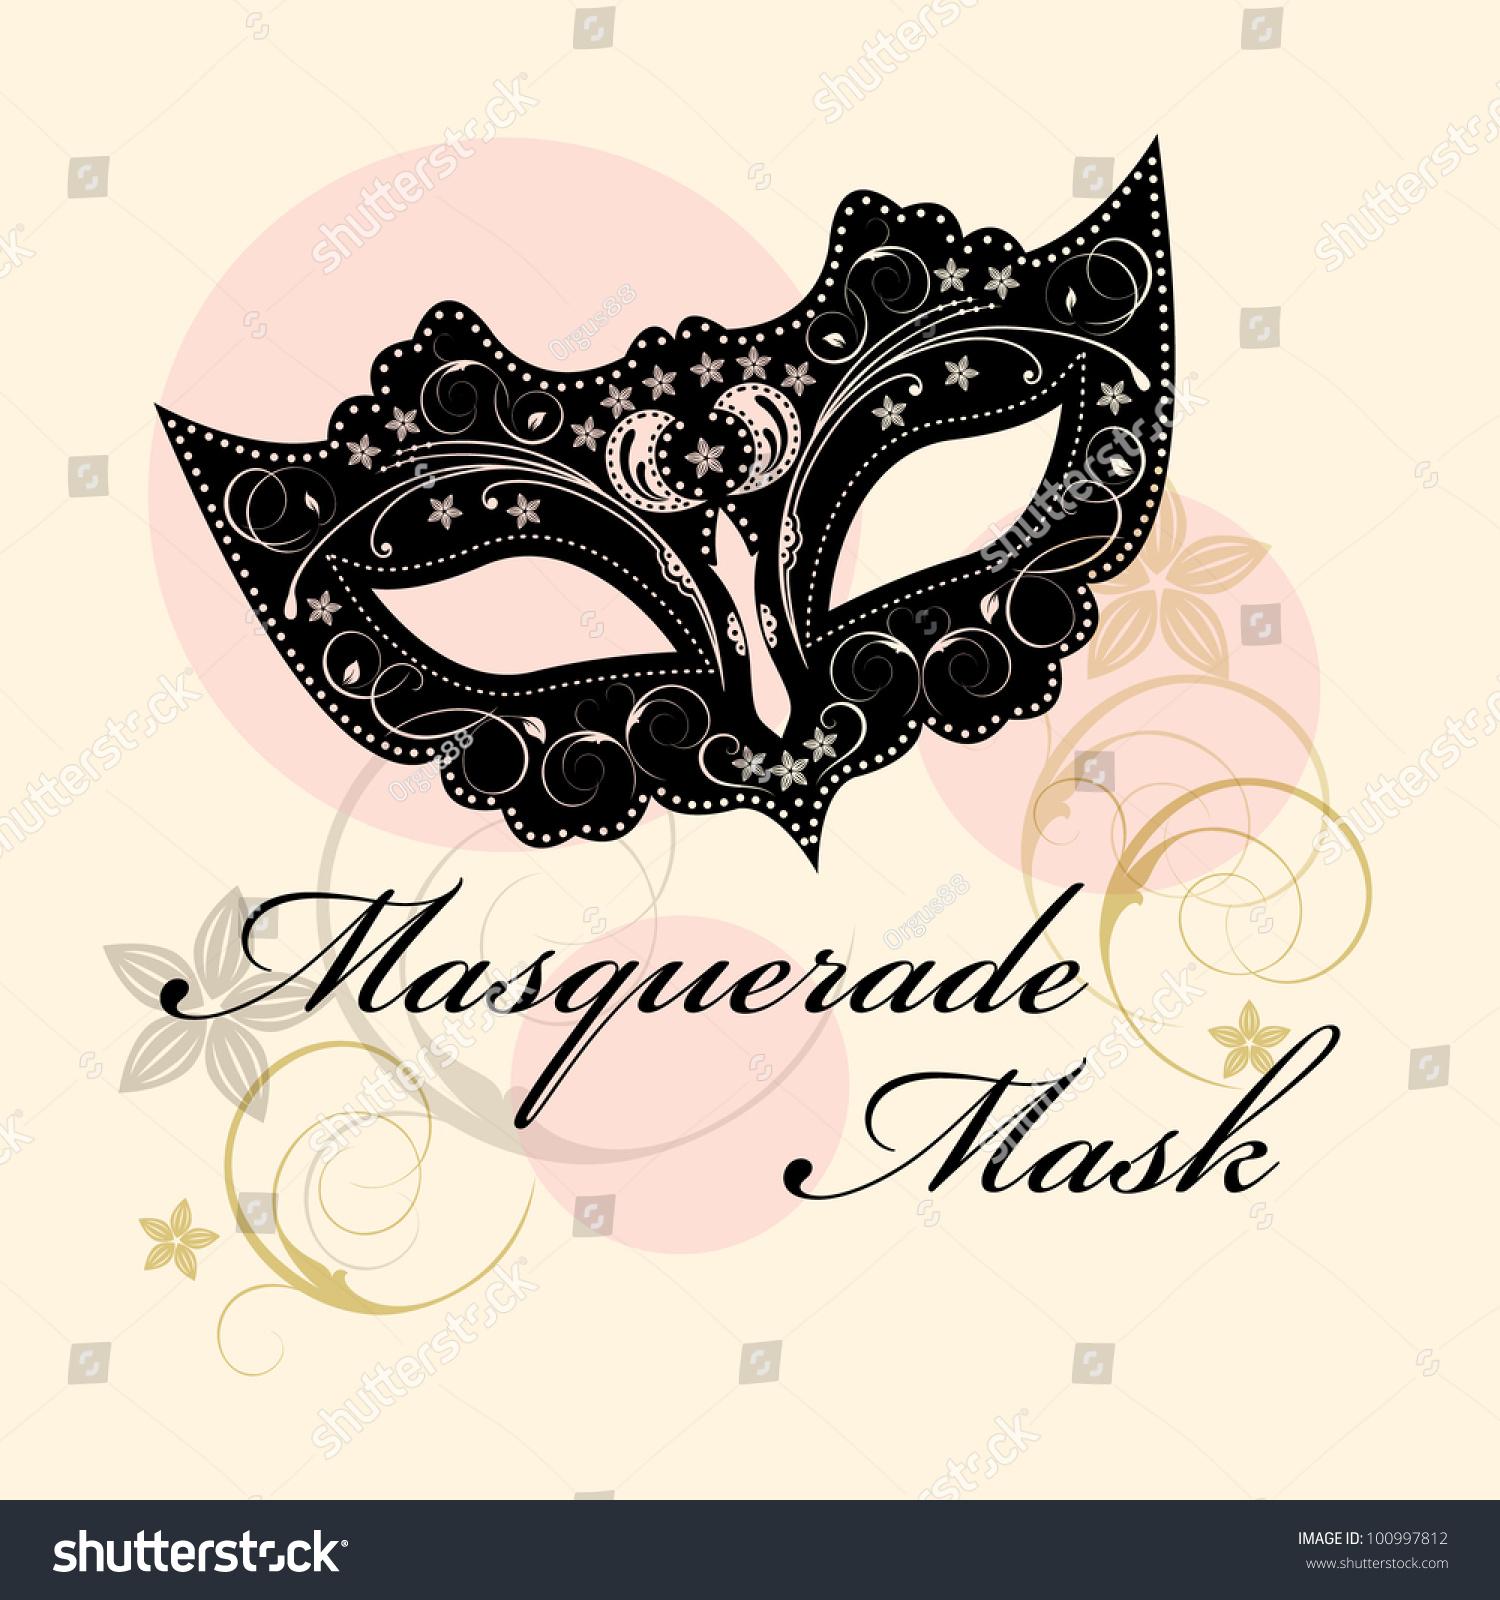 Invitations Masquerade as beautiful invitations layout